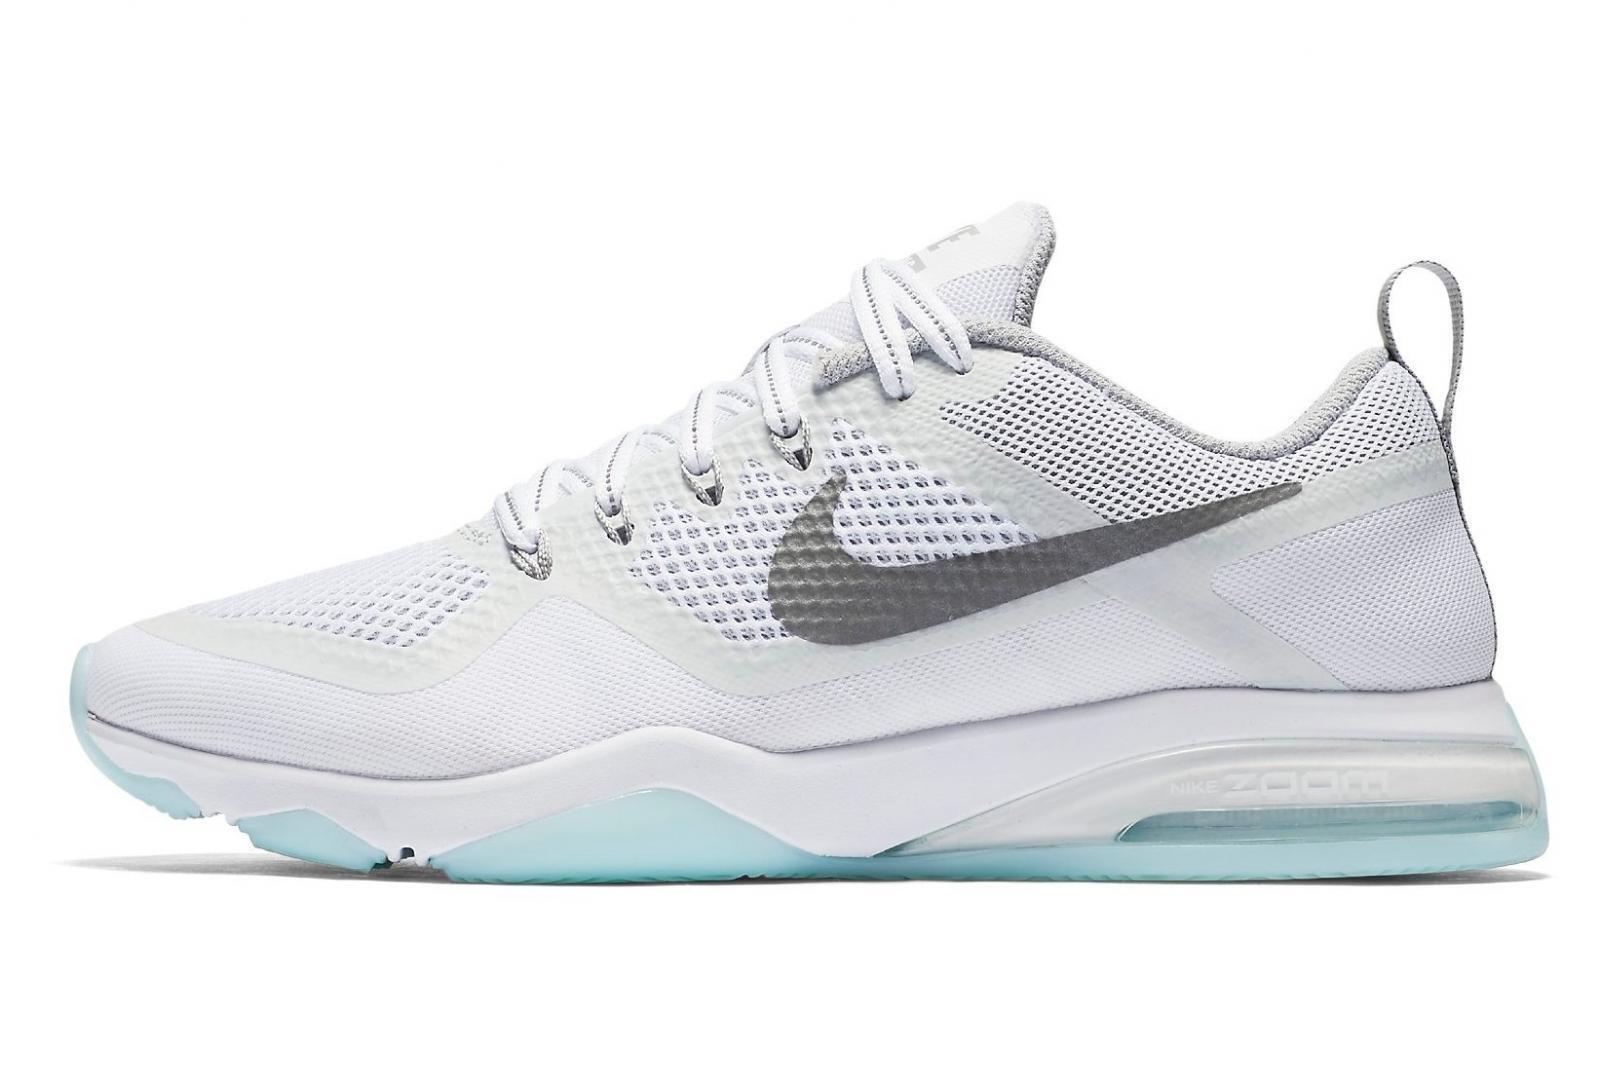 Femme Nike Air Zoom Fitness Blanc reflètent Blanc Fitness Baskets 922878 100 b3256e